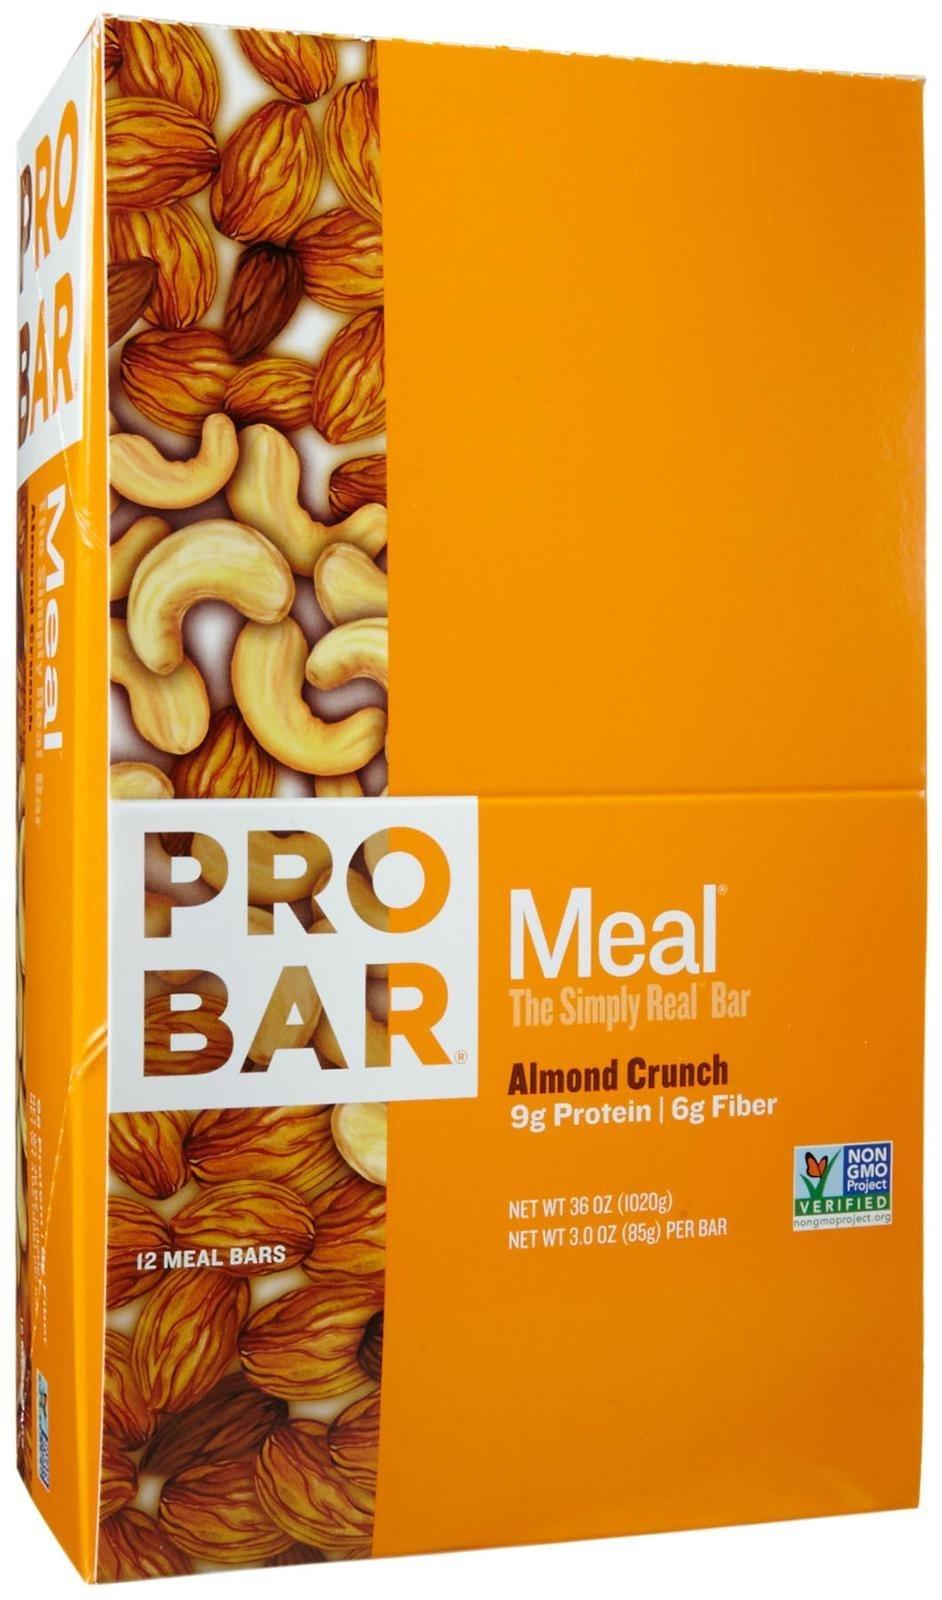 Probar Meal Bars - Almond Crunch - 3 oz - 12 ct